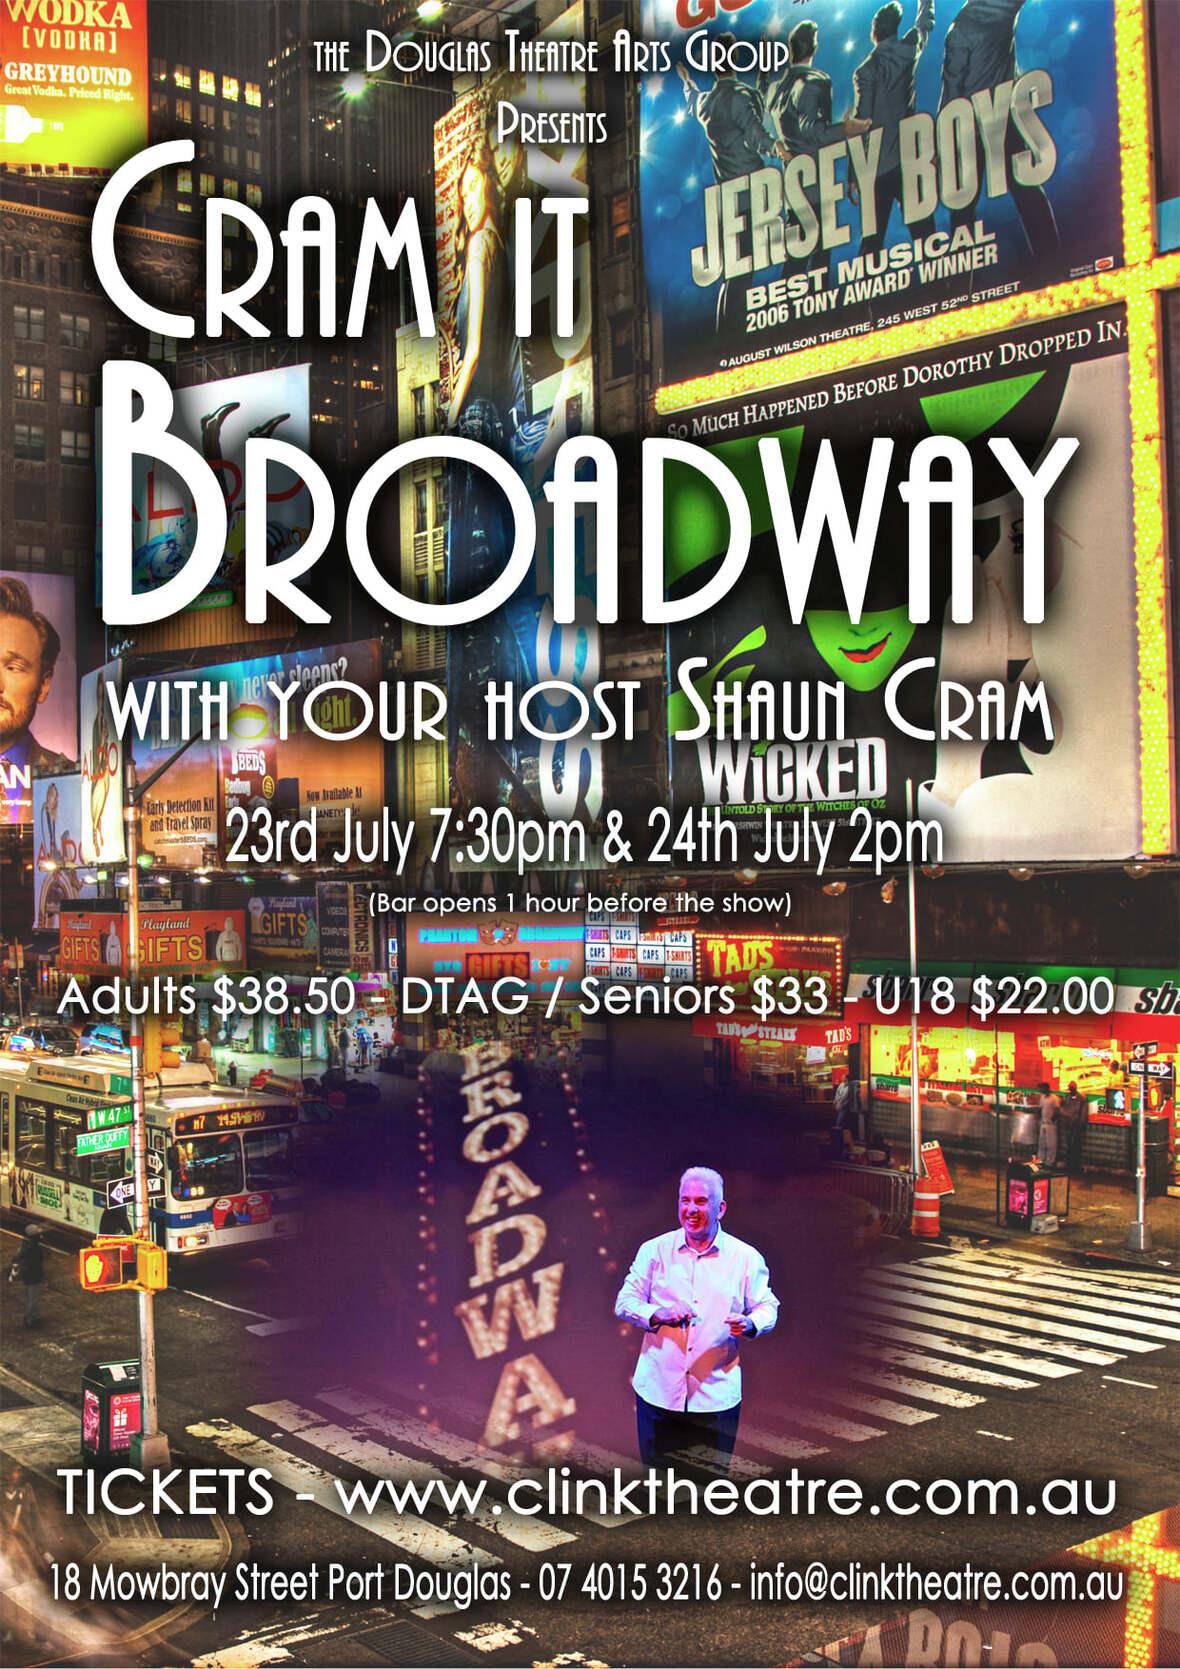 cram it on broadway